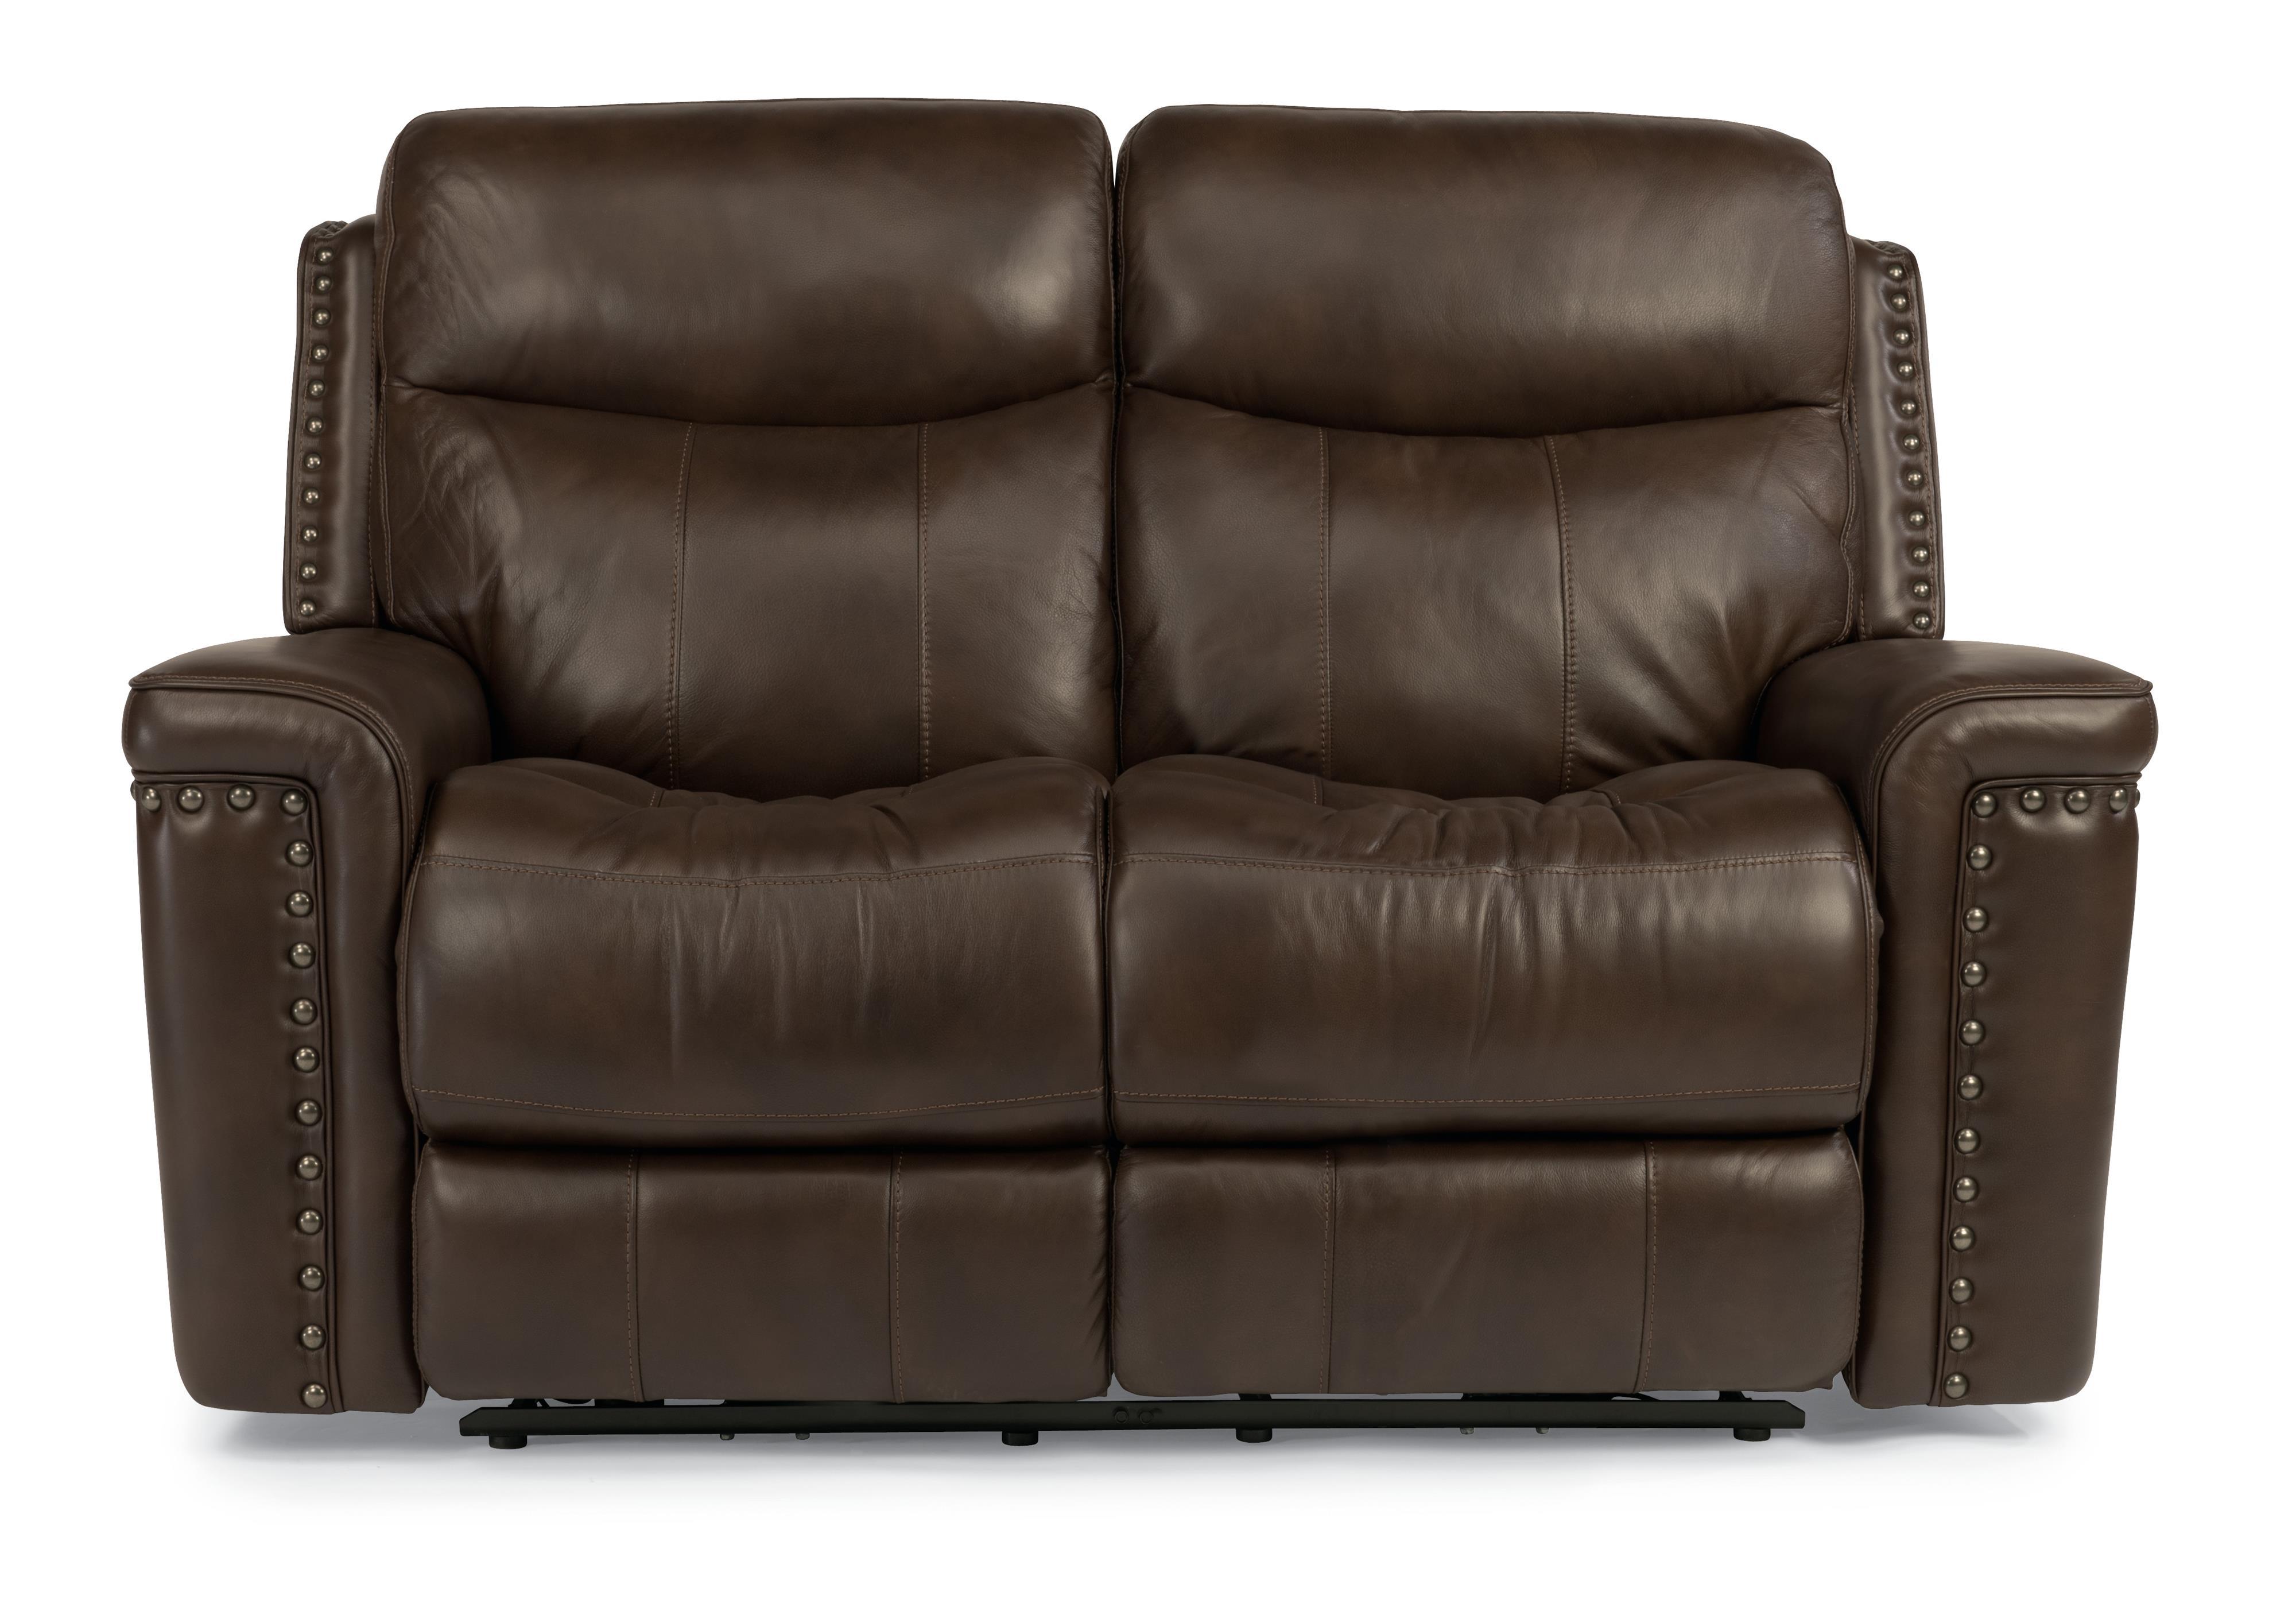 Flexsteel Latitudes-Grover Power Reclining Love Seat - Item Number: 1339-60P-014-74